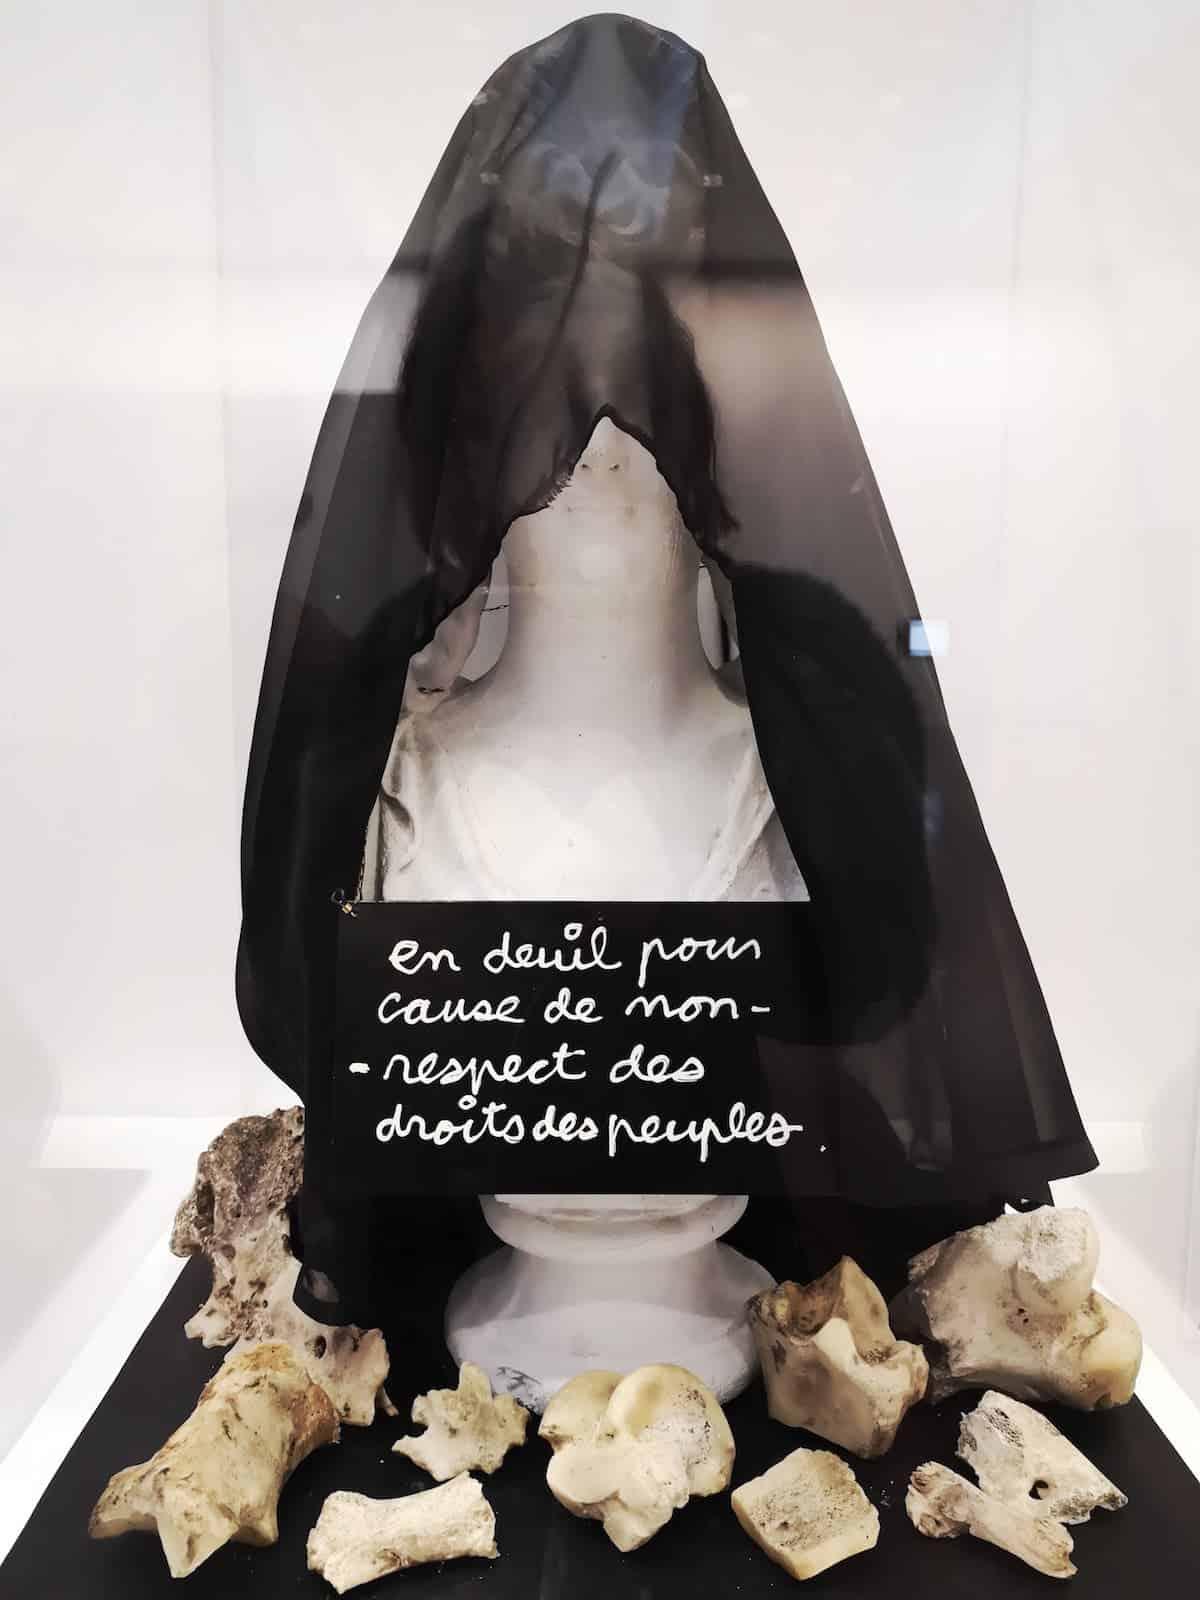 exposition-persona-grata-musee-immigration-mac-val-paris-12em-vitry